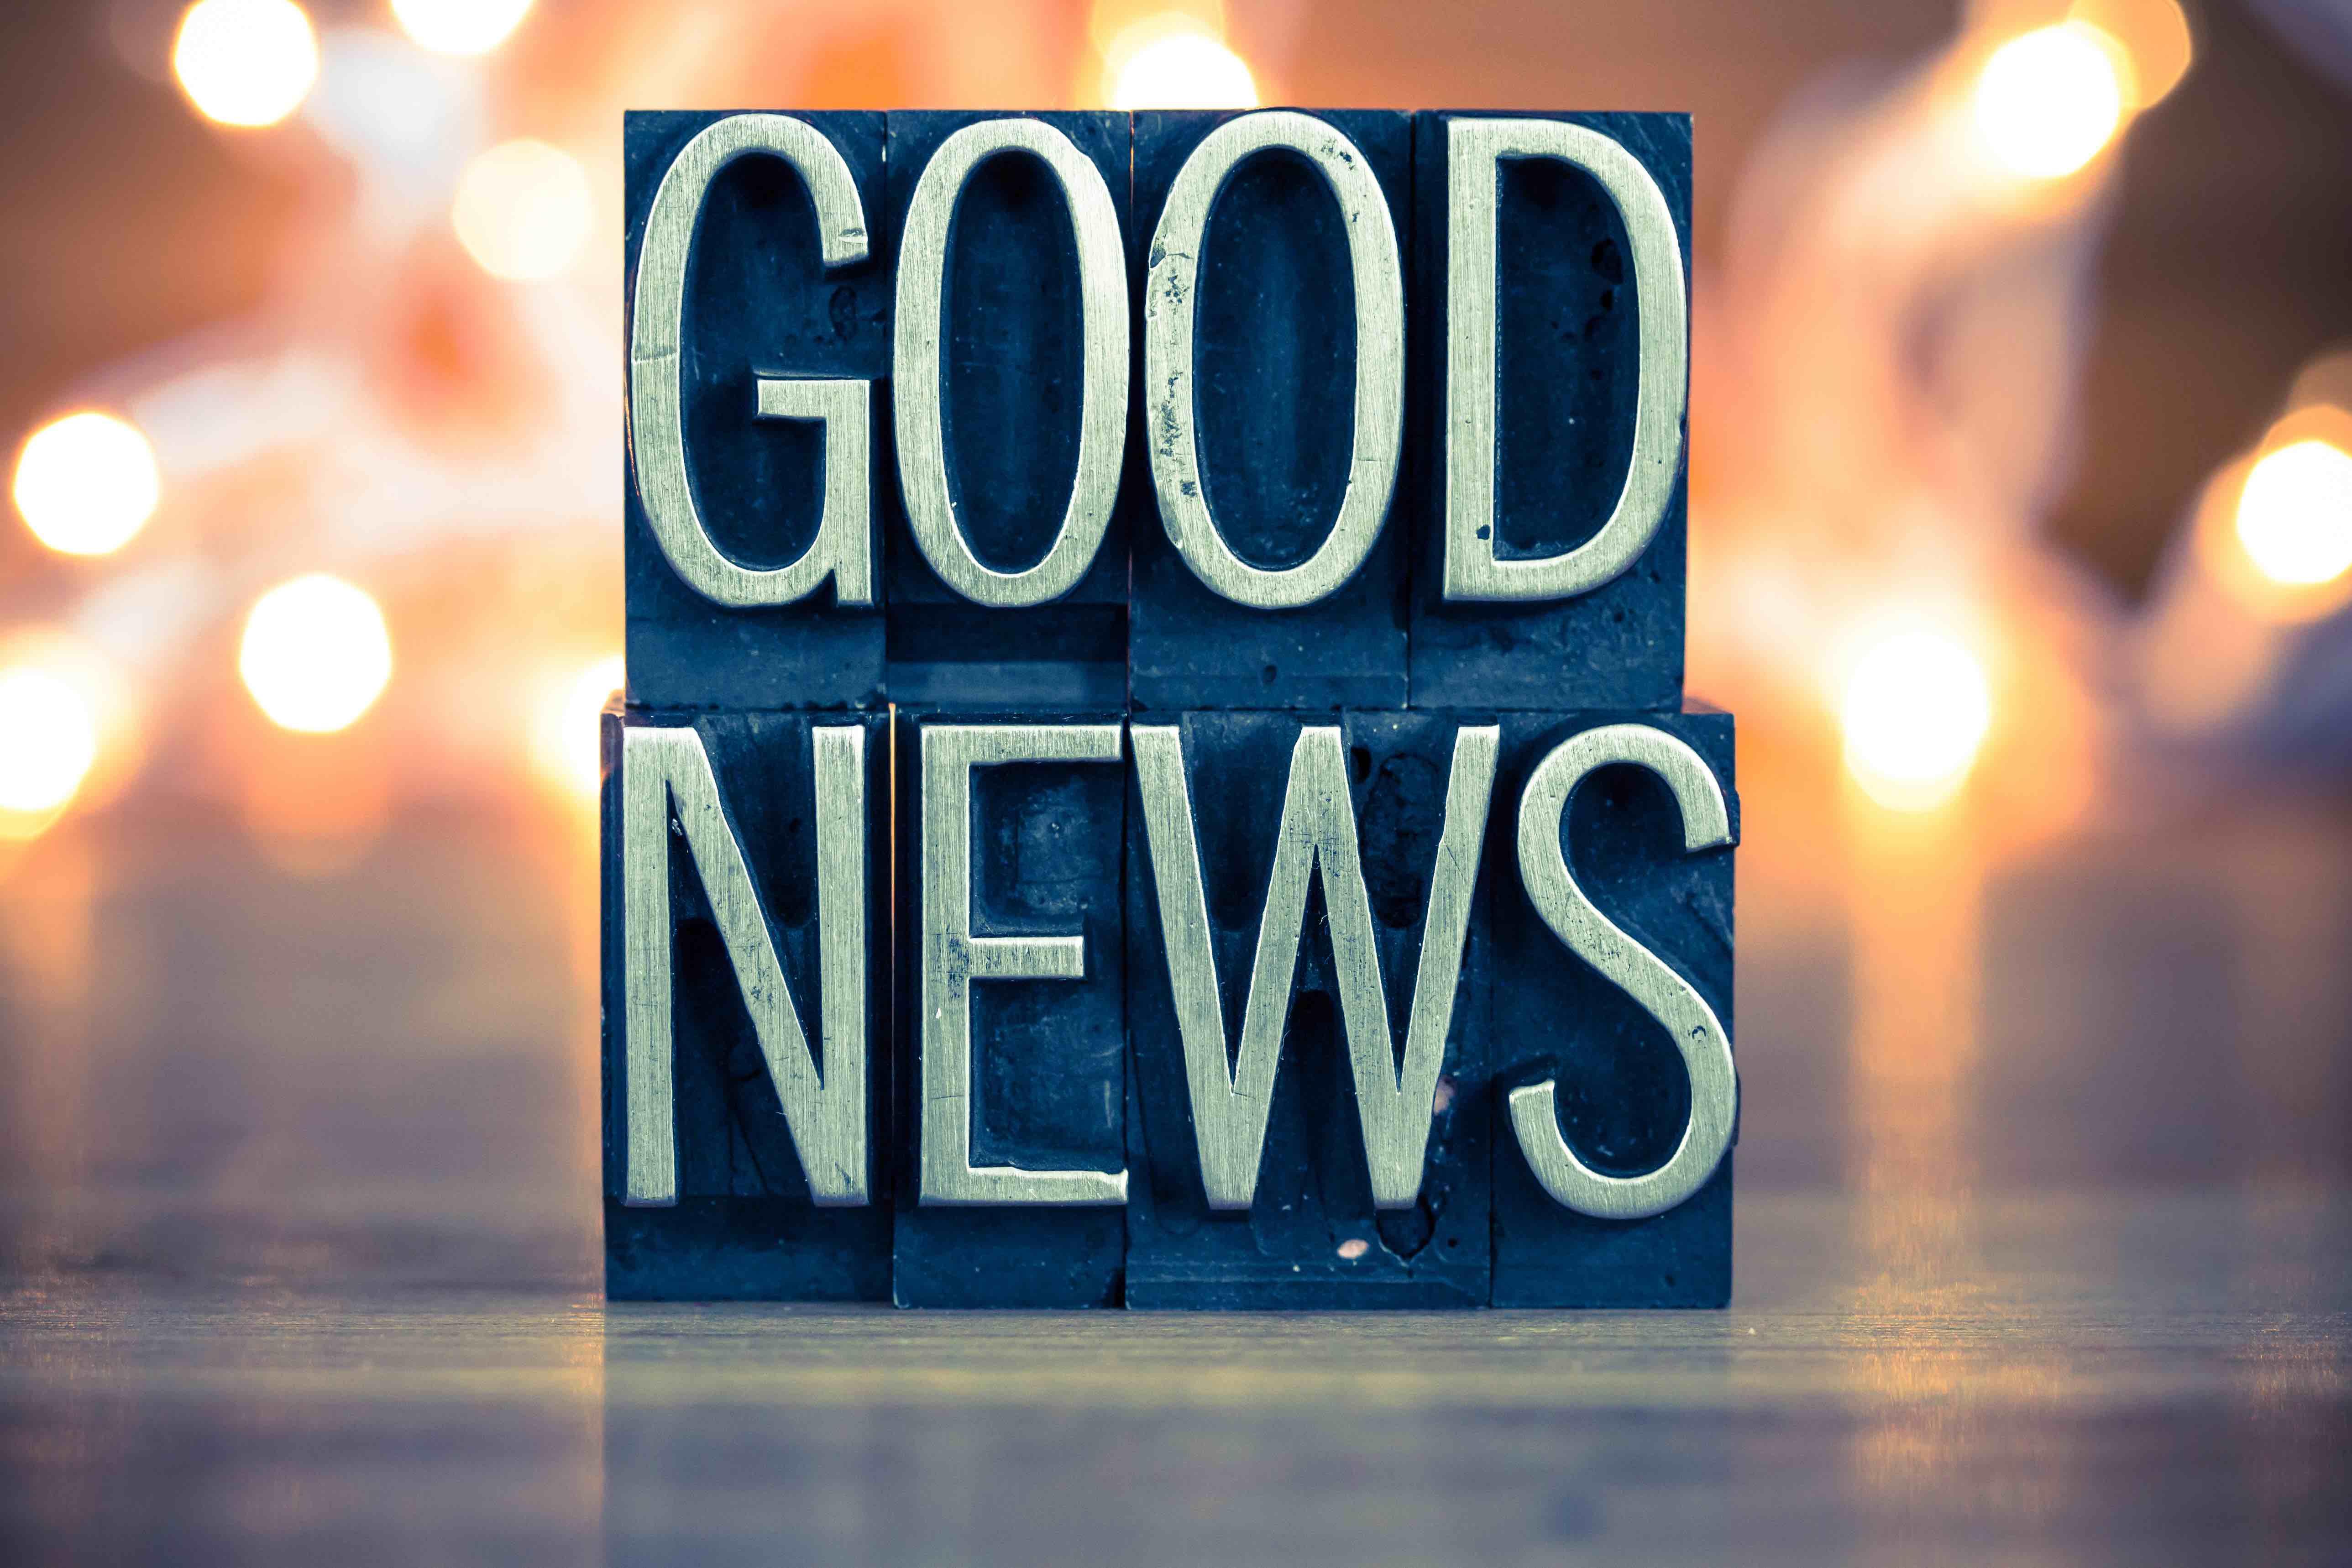 True News, Fake News, Good News | THE BROOK NETWORK